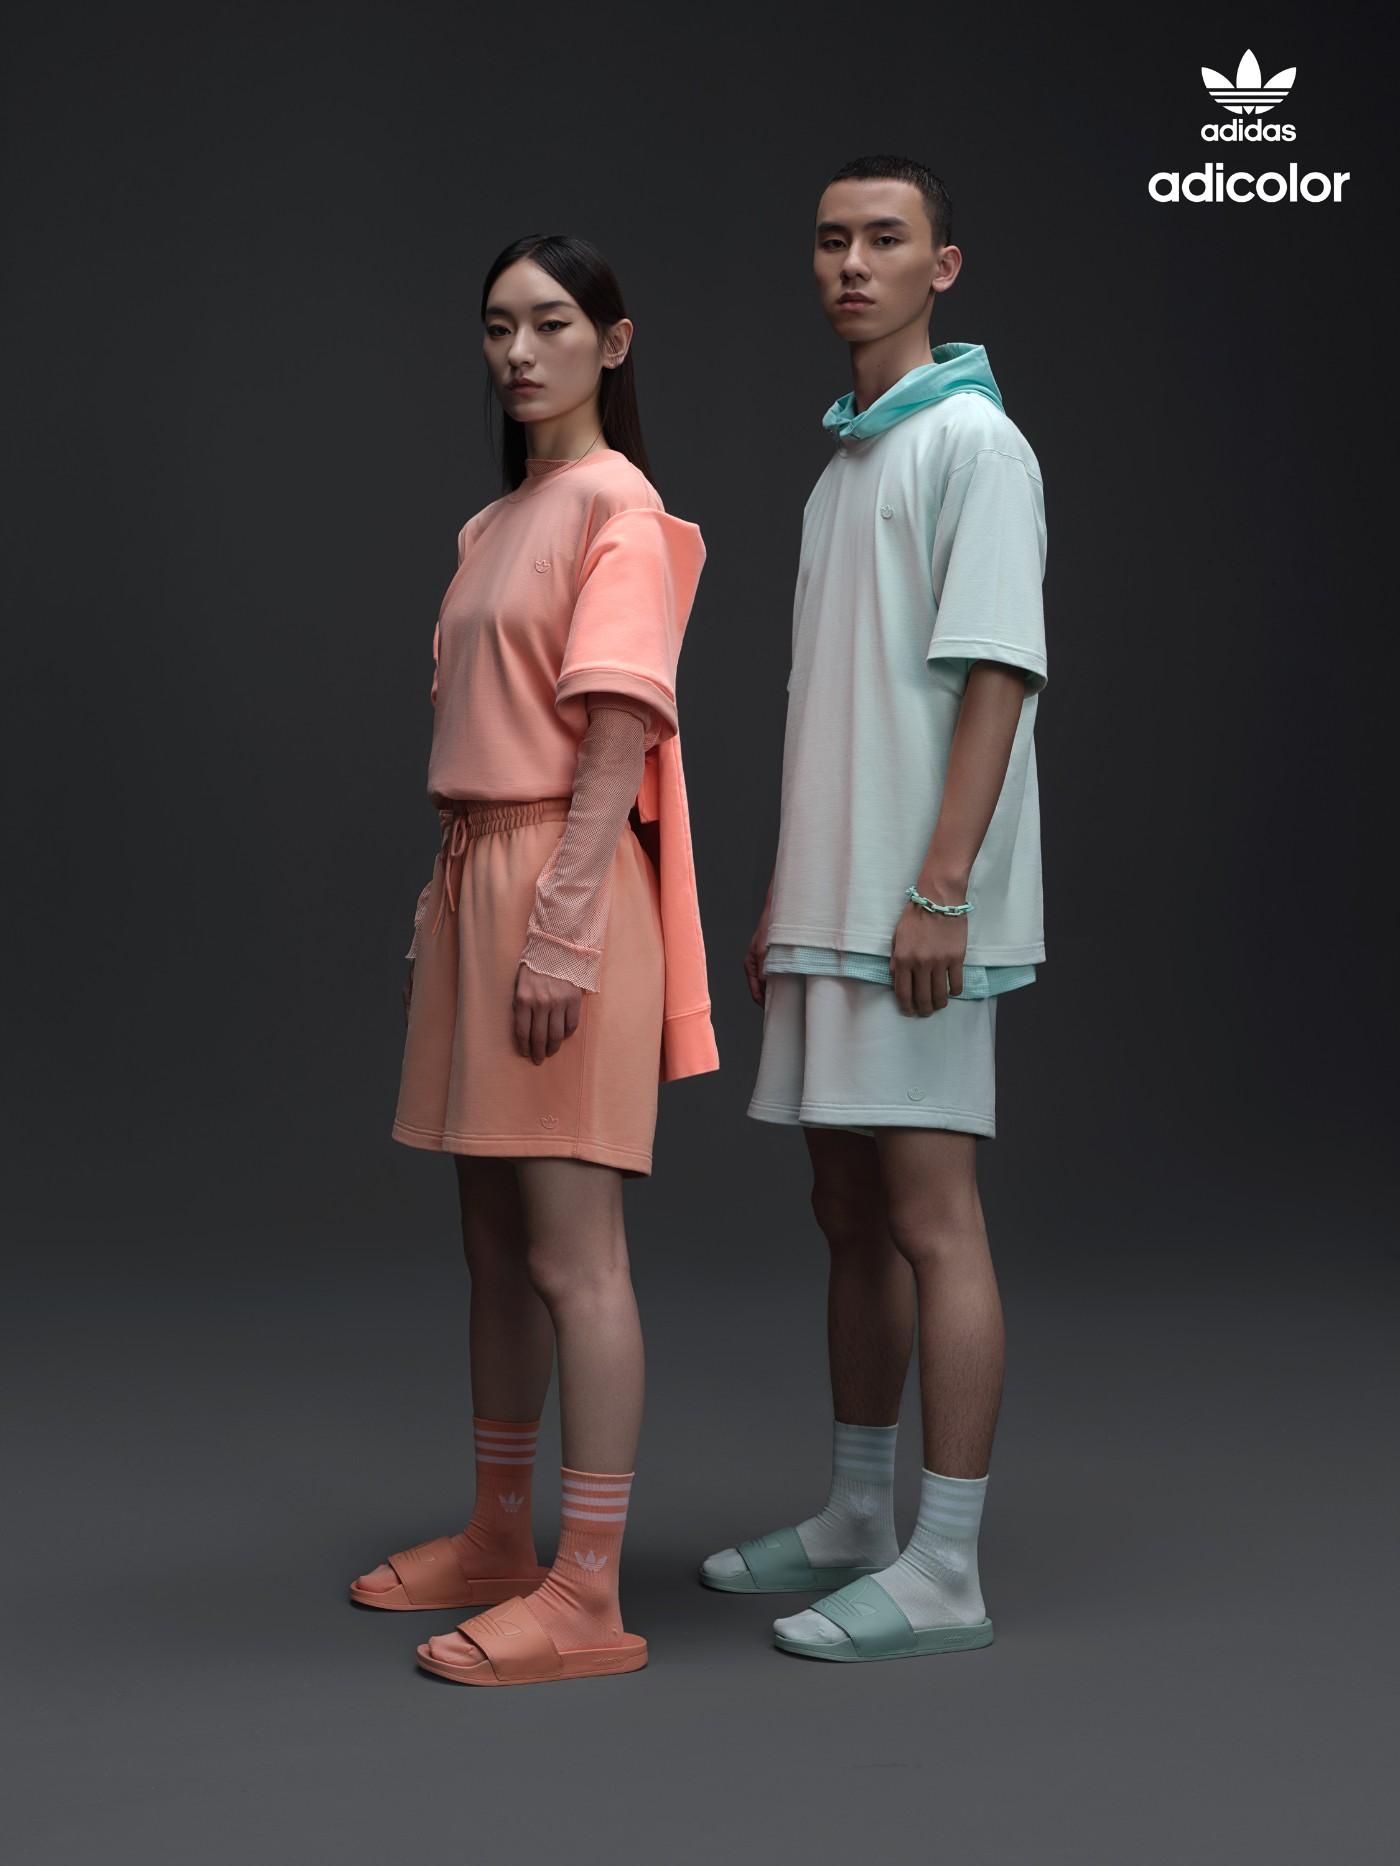 adidas,Originals,adicolor,Cont  独特色彩美学! 全新 adidas adicolor 系列现已发售!